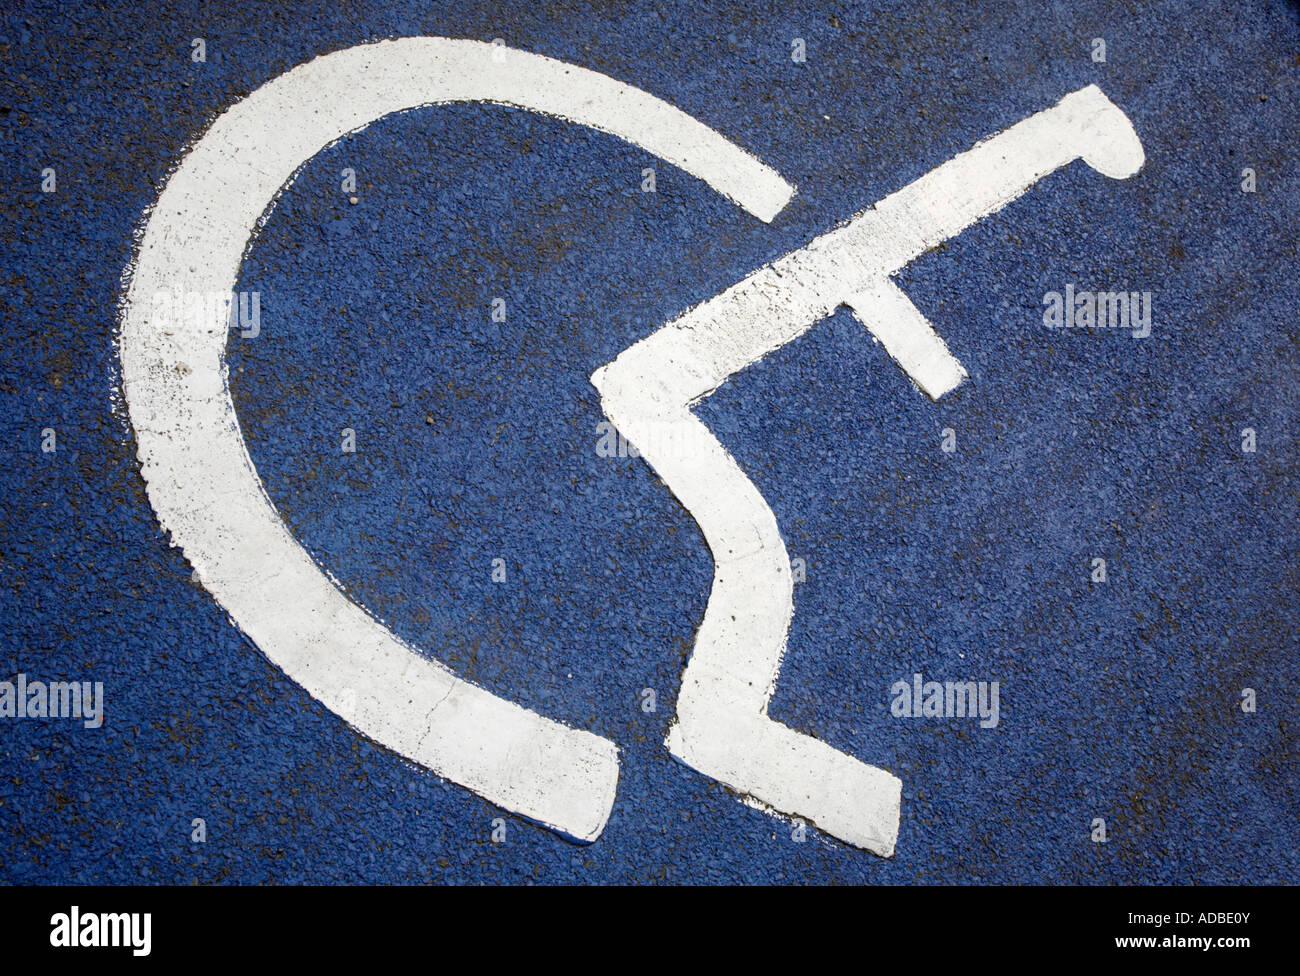 disabled sign in car parking stockfotos disabled sign in. Black Bedroom Furniture Sets. Home Design Ideas